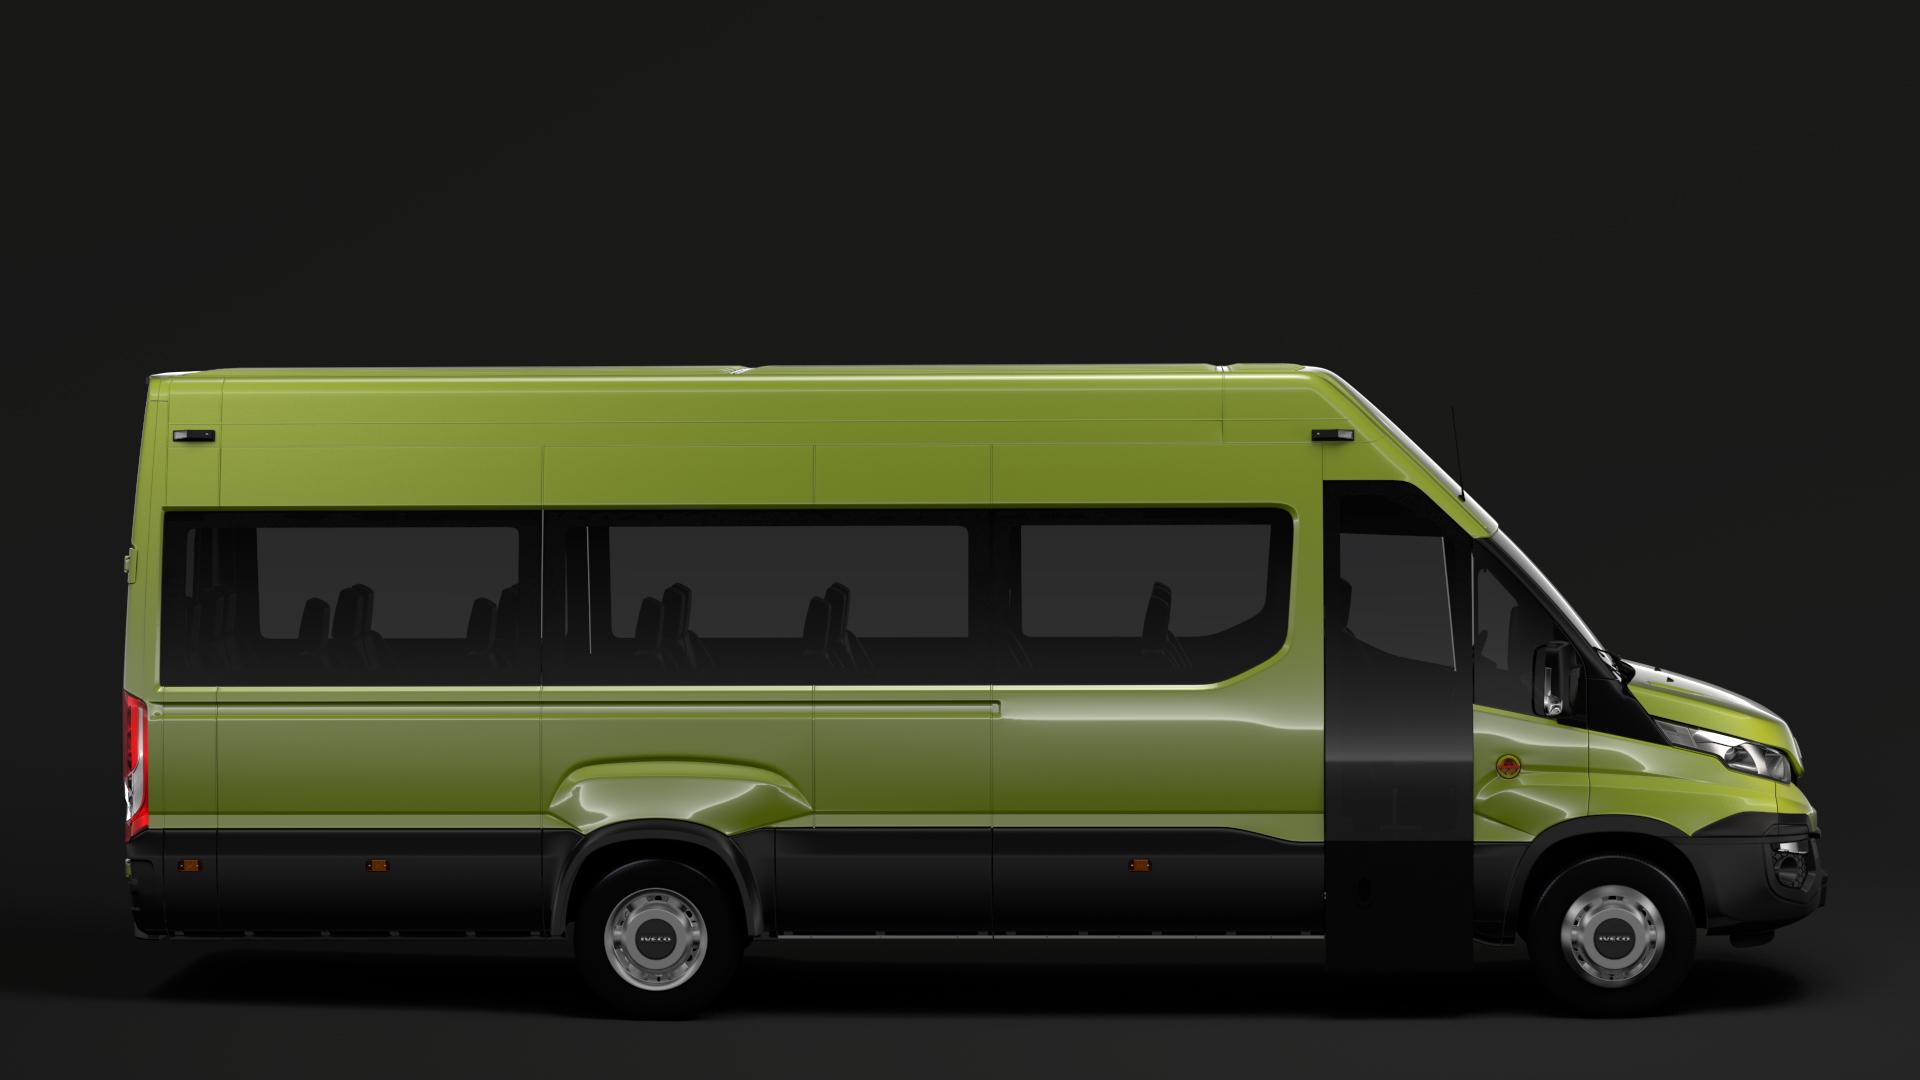 iveco daily tourus l5h3 20014-2016 3d model max fbx c4d lwo ma mb hrc xsi obj 275710